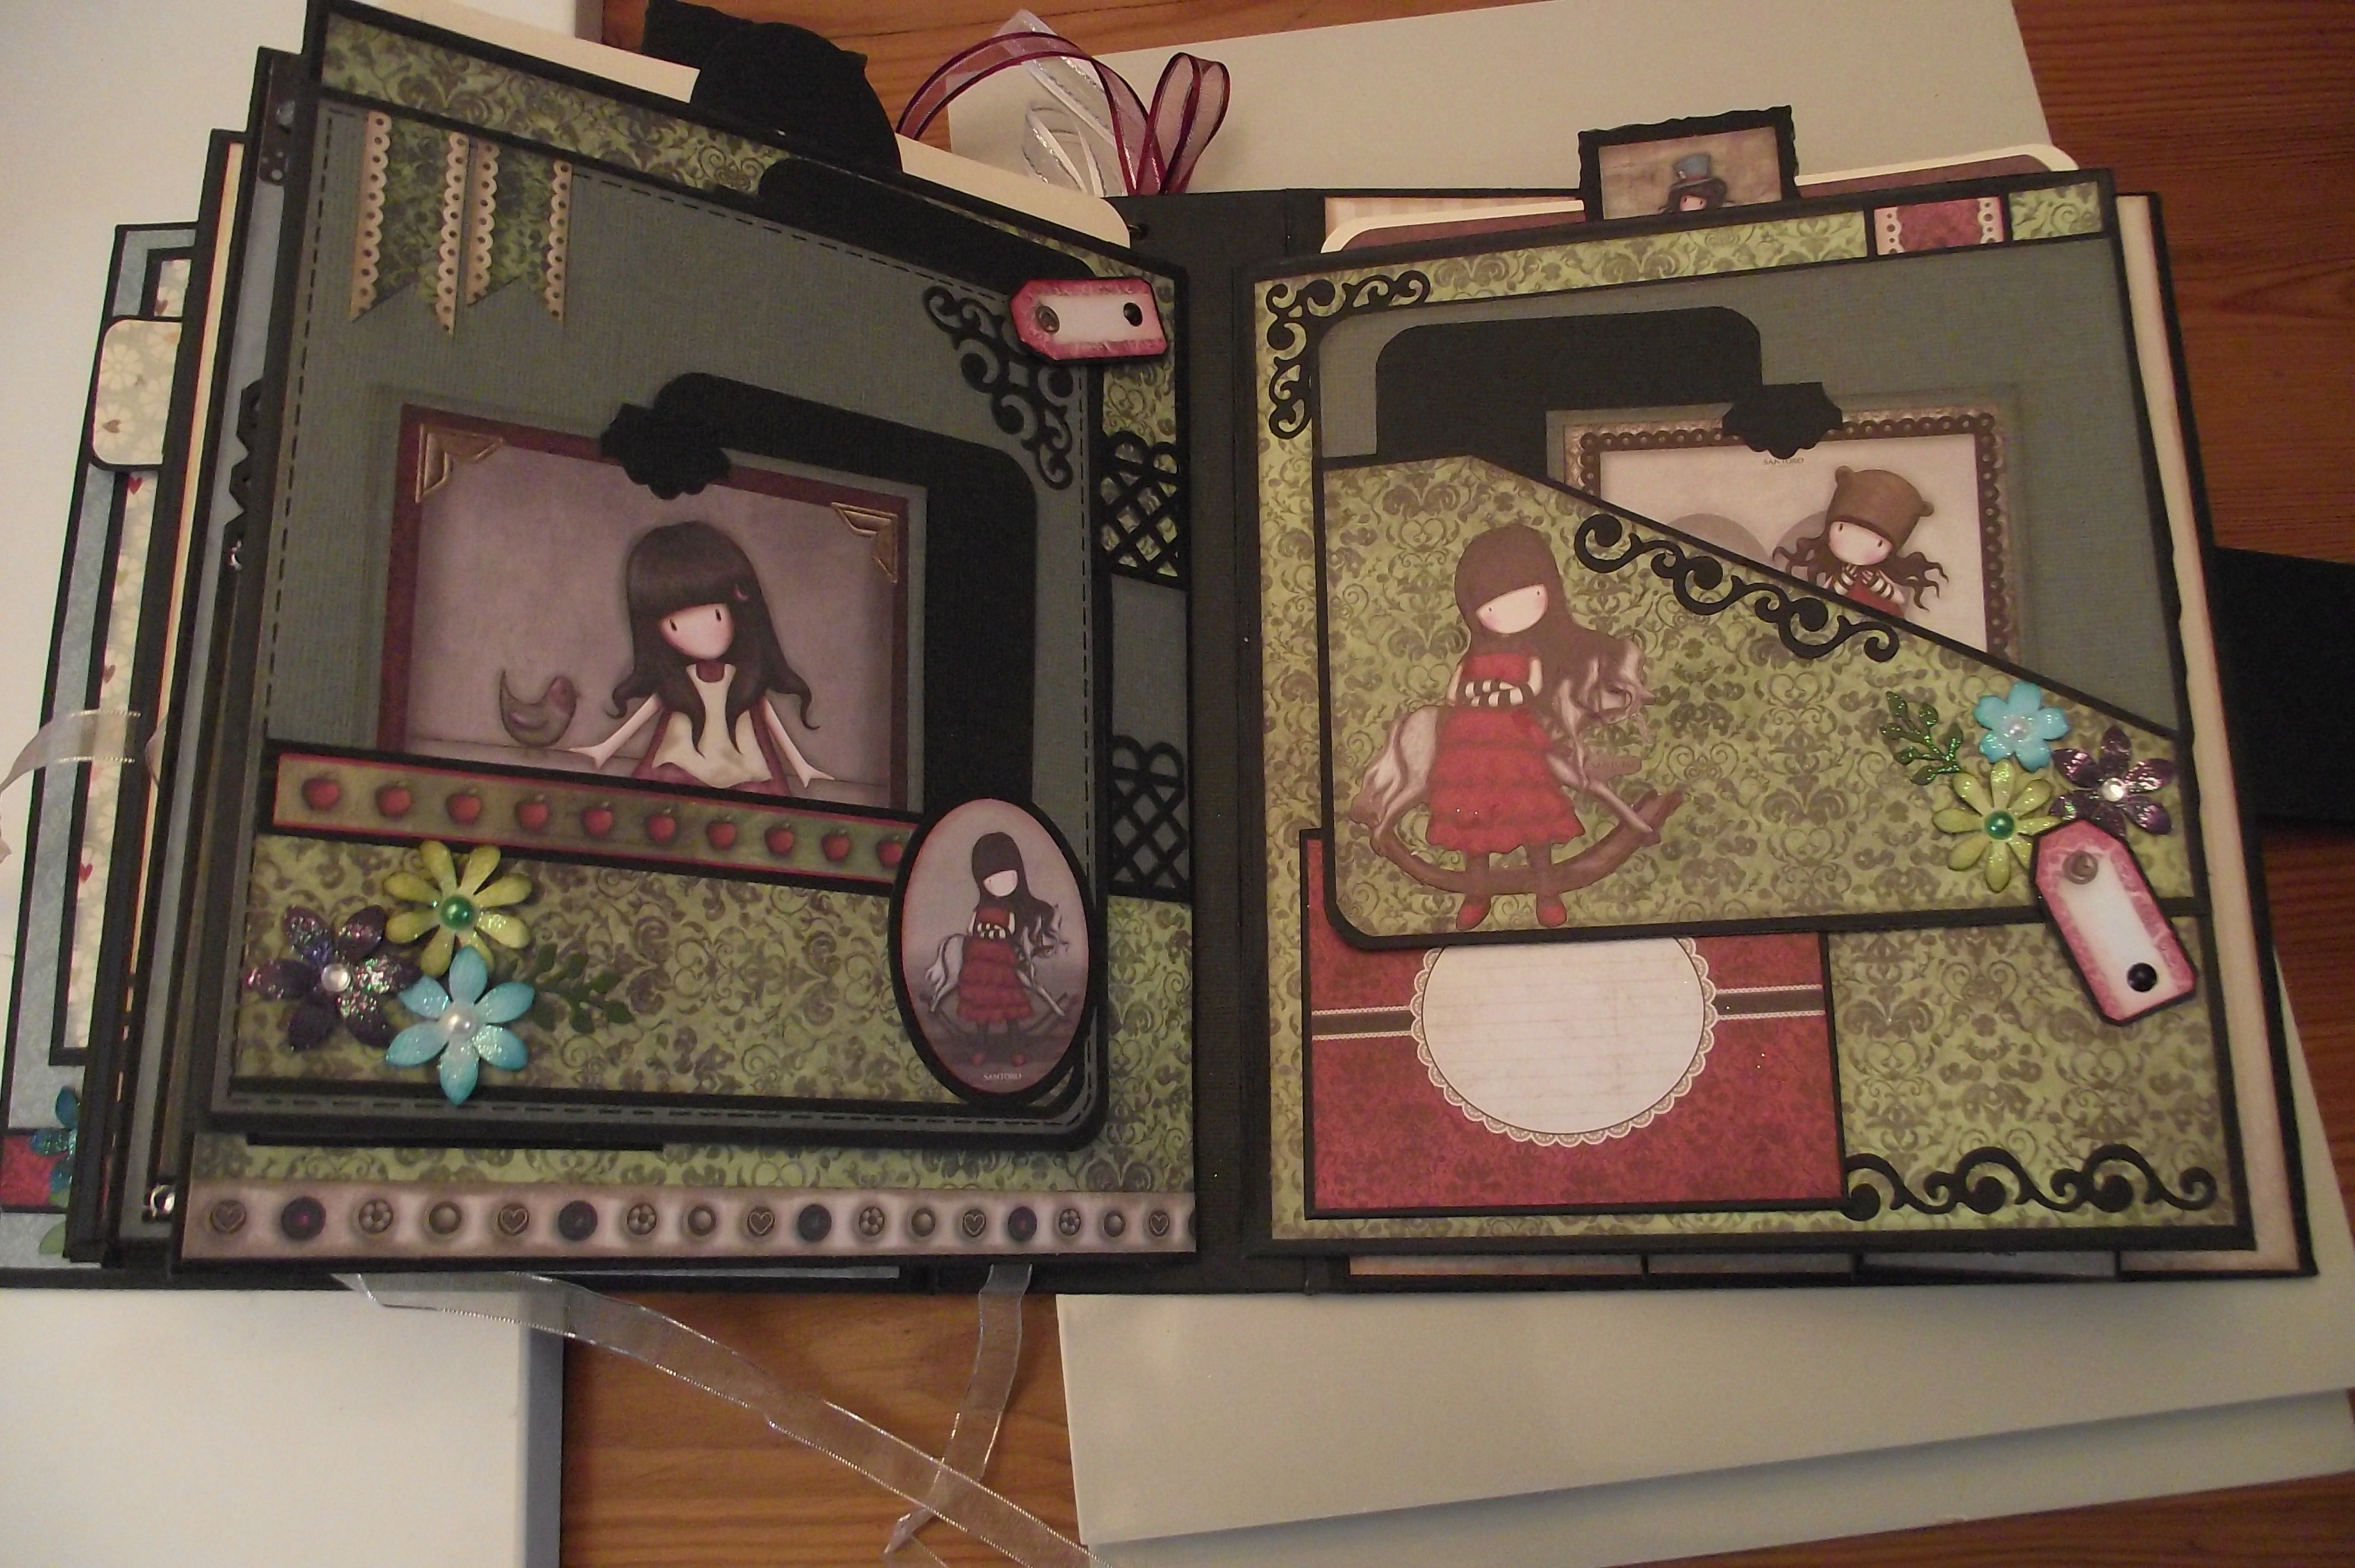 560 Gorjuss Isn T She Ideas Cute Art Paper Dolls Stamp Layouts